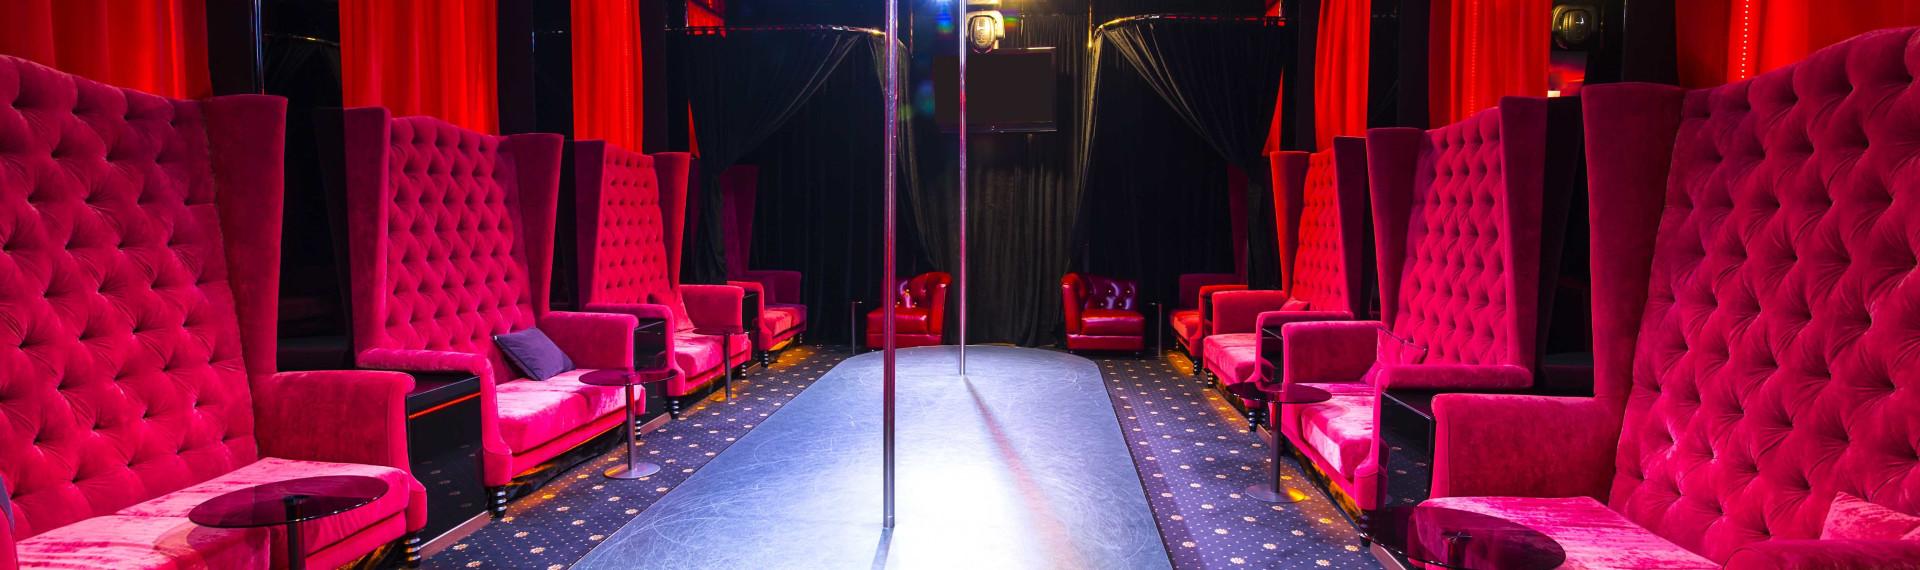 Stripclub VIP Stuttgart